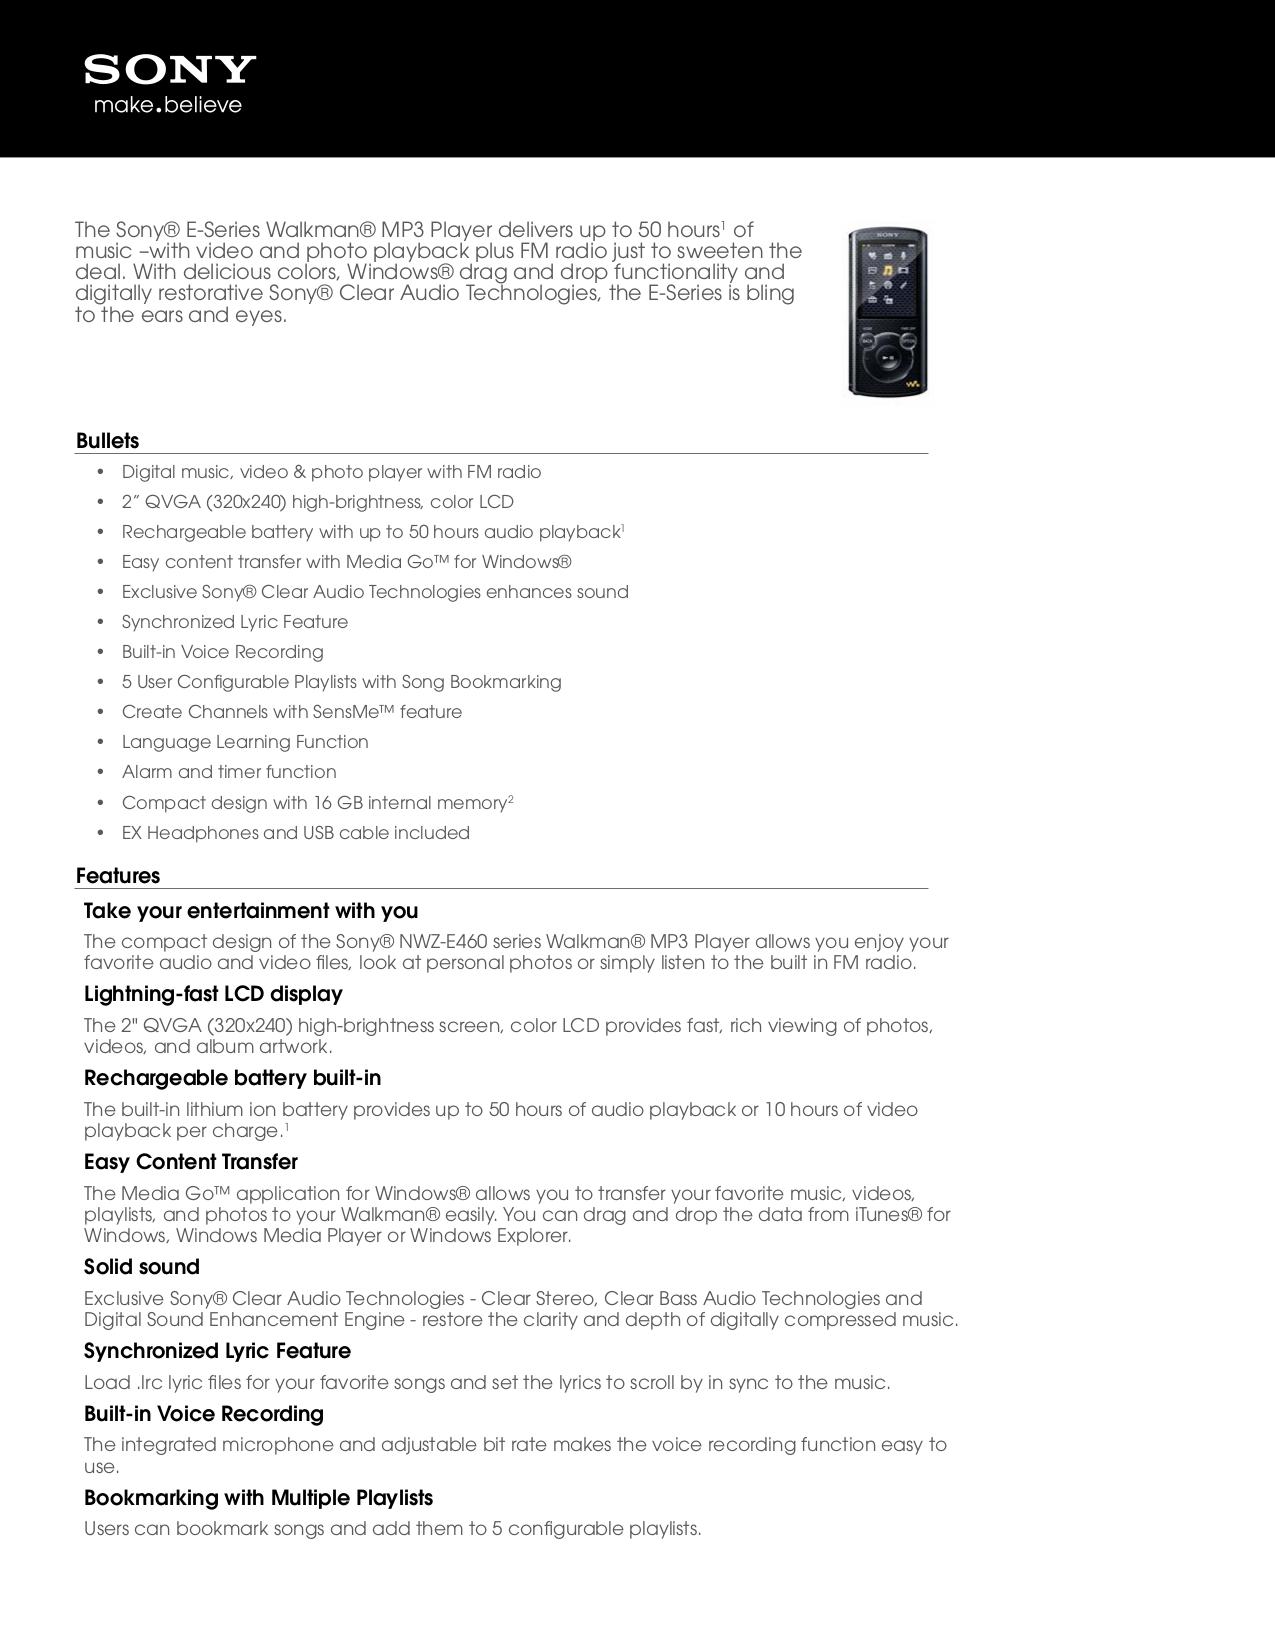 download free pdf for sony walkman nwz e464 mp3 player manual mp4 sony walkman nwz-e464 driver mp4 sony walkman nwz-e464 driver